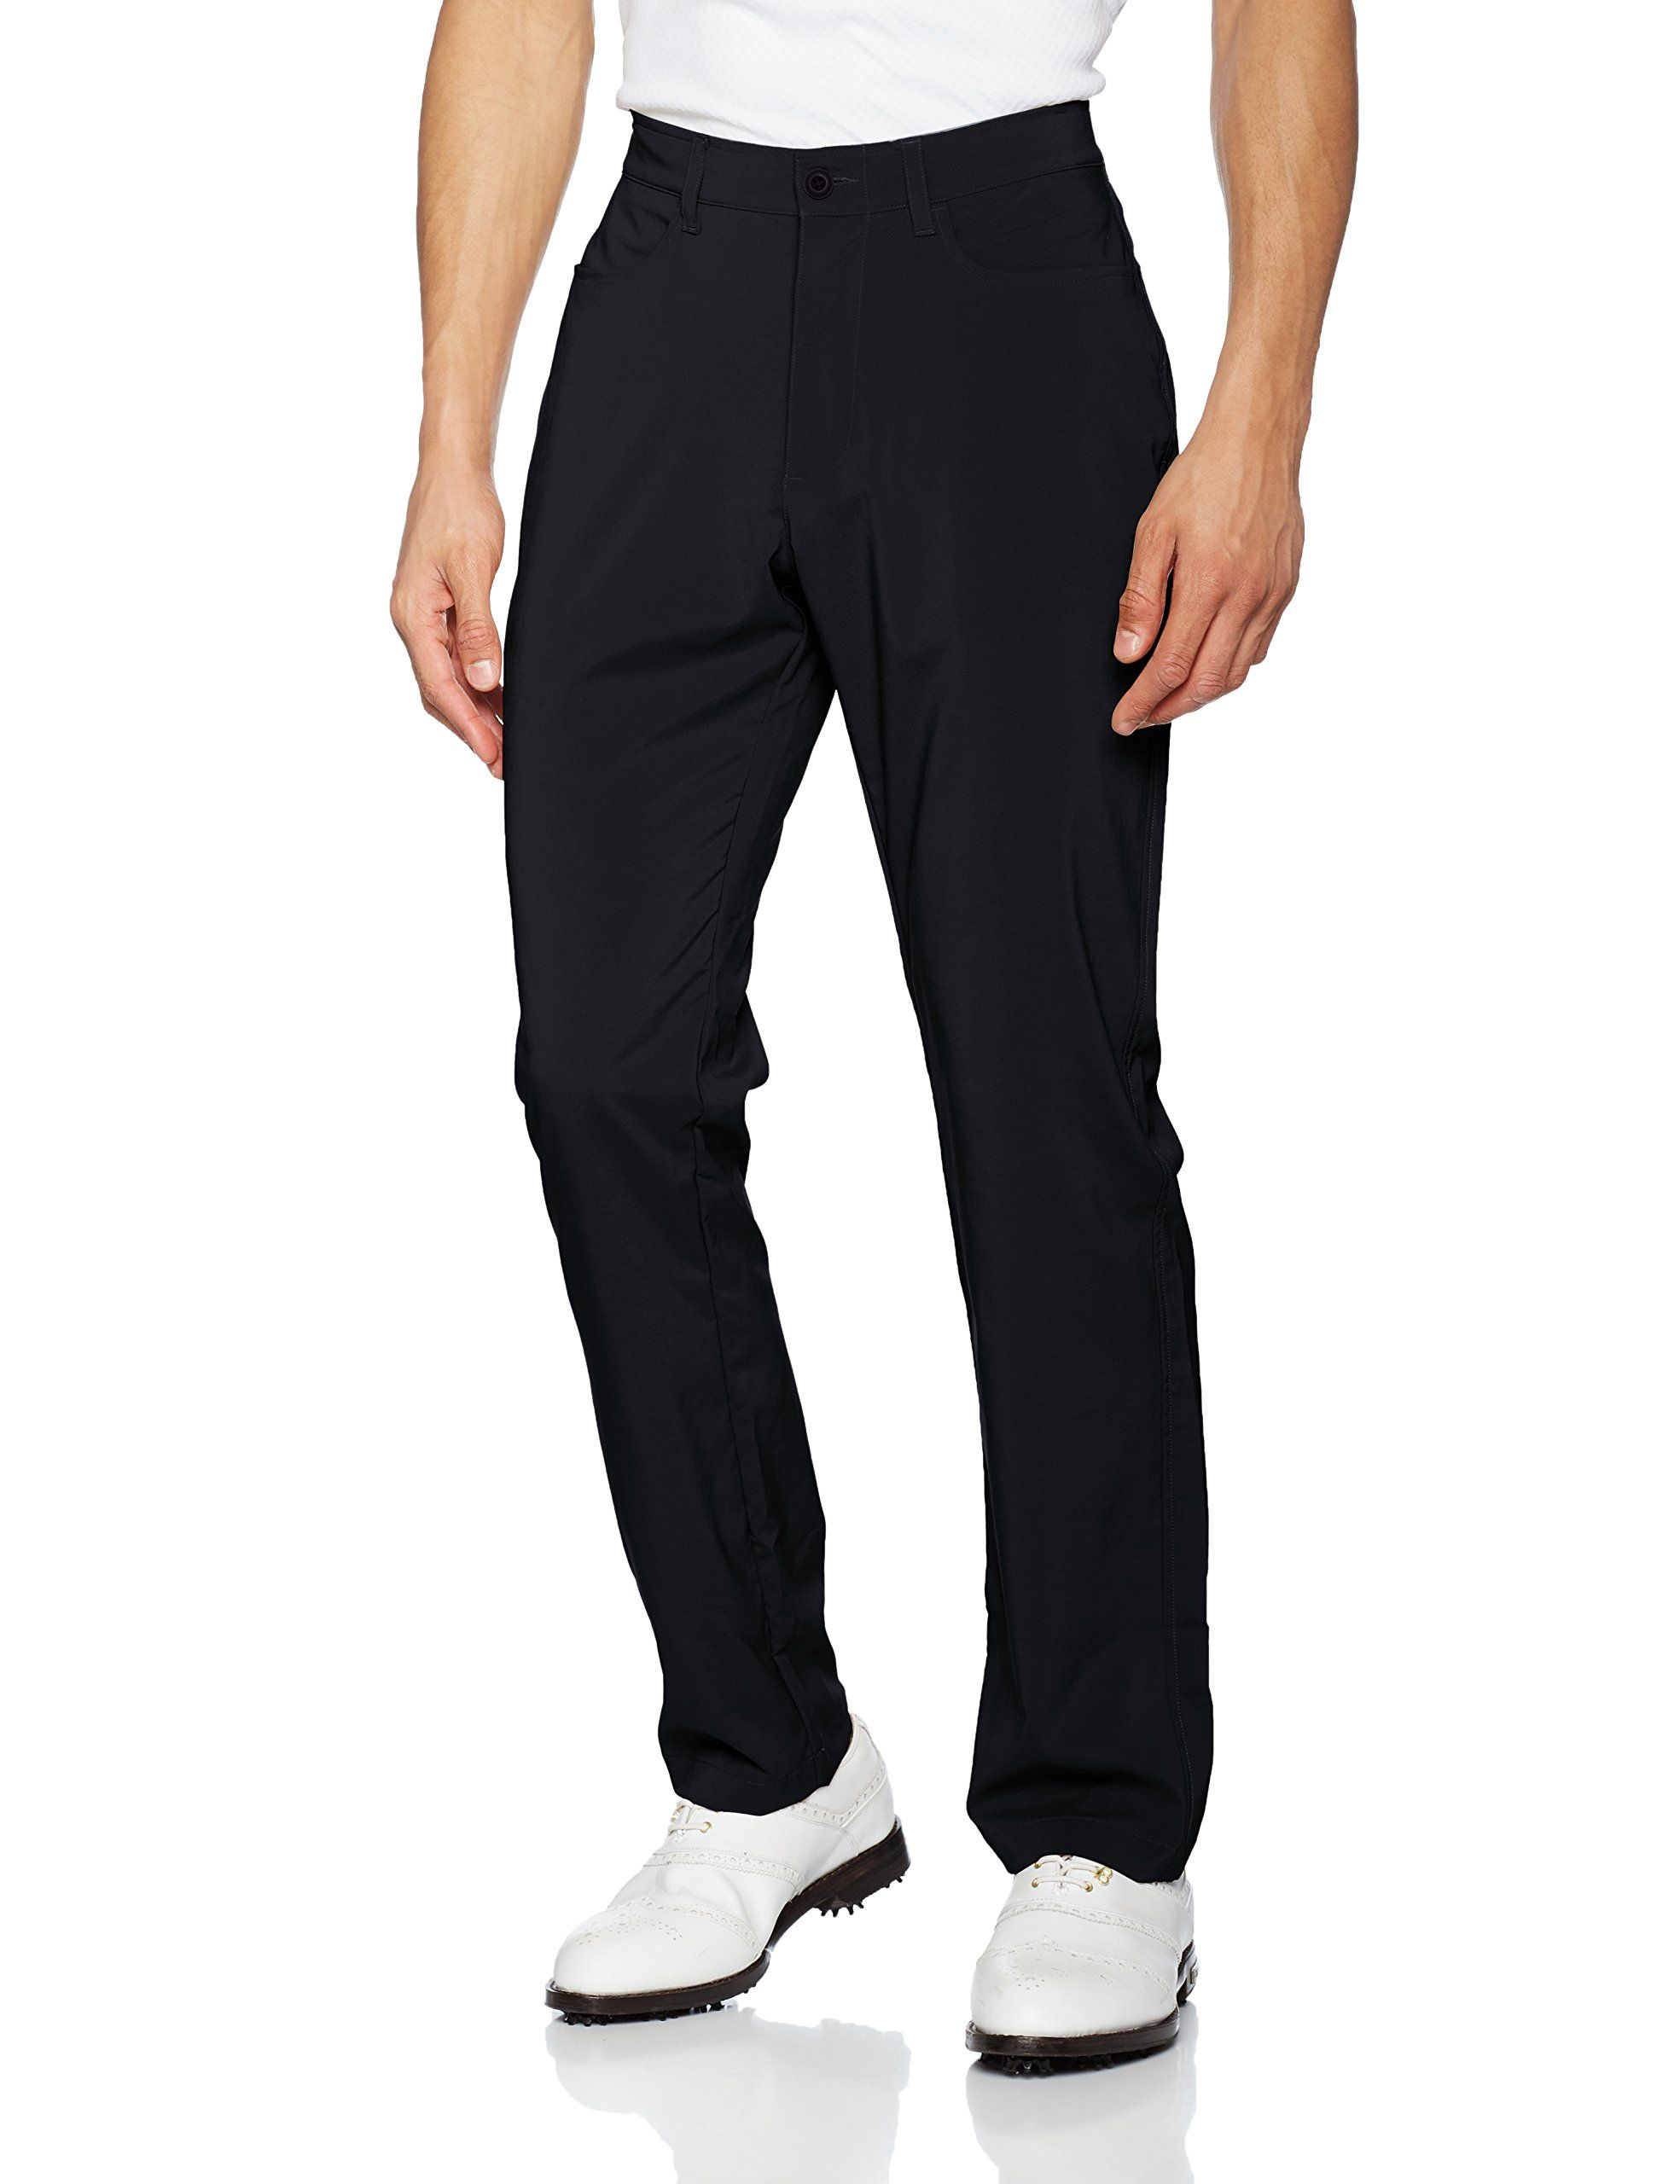 Under Armour Mens Tech Golf Pants Black 34/32 Check